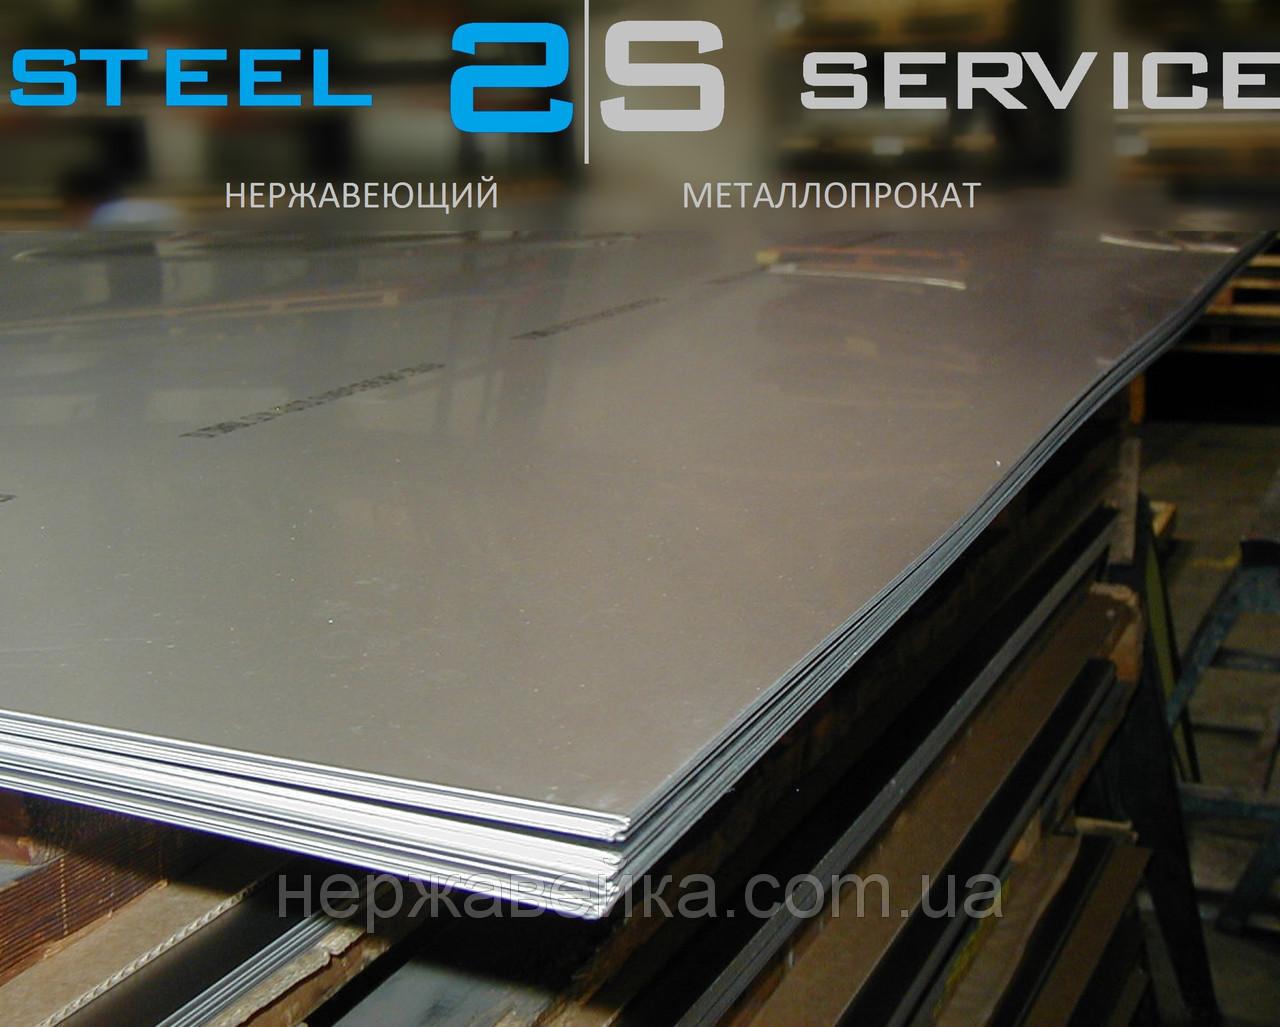 Листовая нержавейка 6х1000х2000мм  AISI 316Ti(10Х17Н13М2Т) F1 - горячекатанный,  кислотостойкий